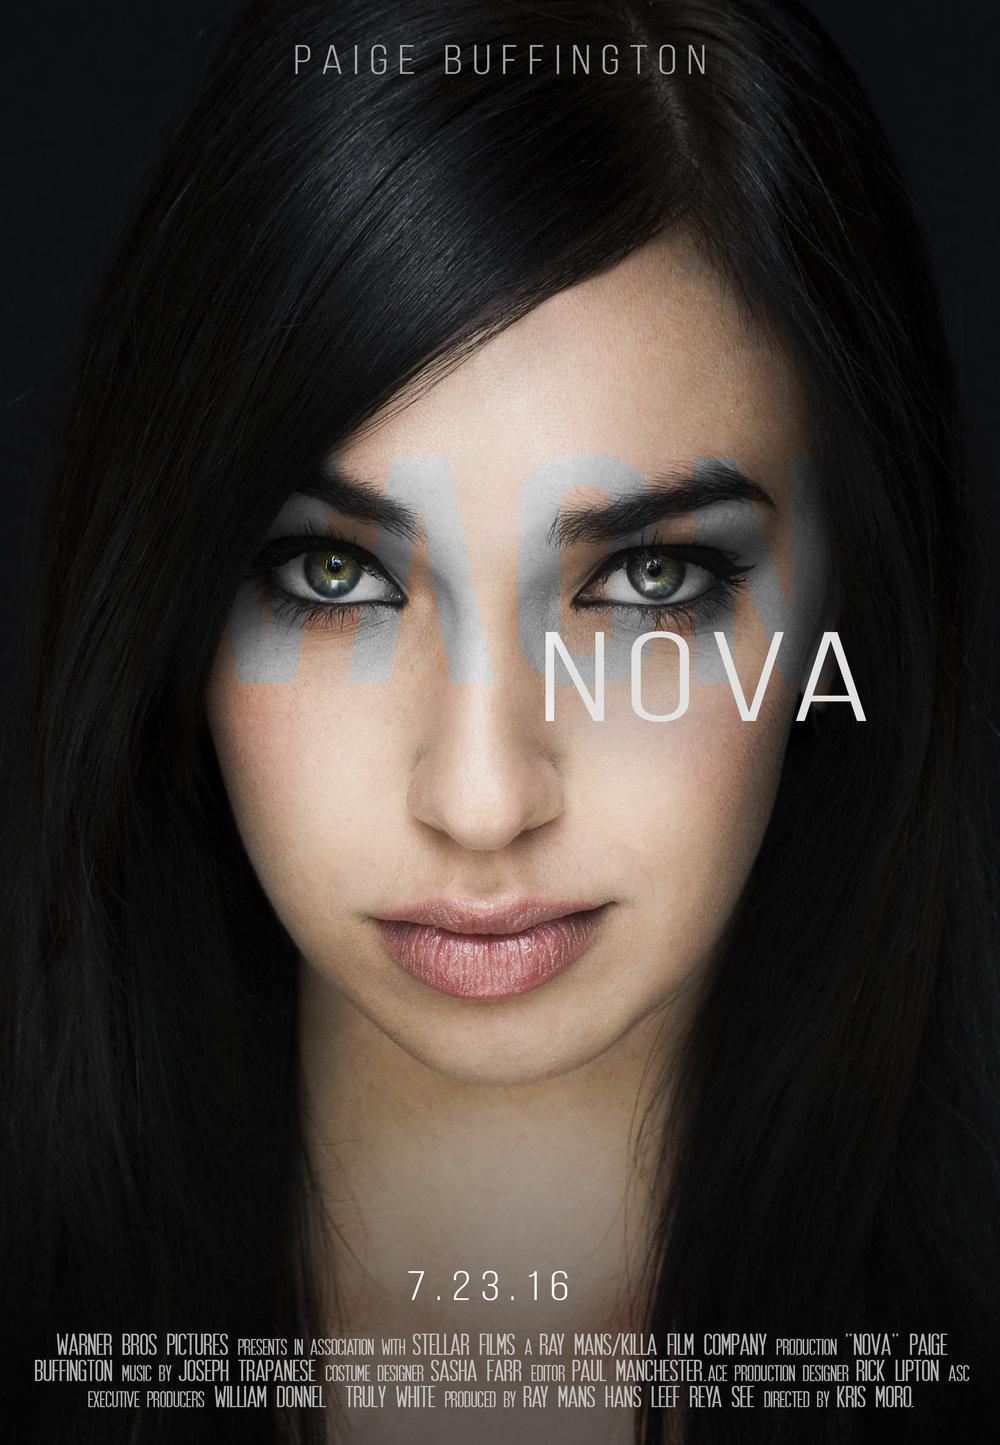 """Nova""  Mock movie poster inspired by the artwork for ""Salt"", photo self-taken March 2016"